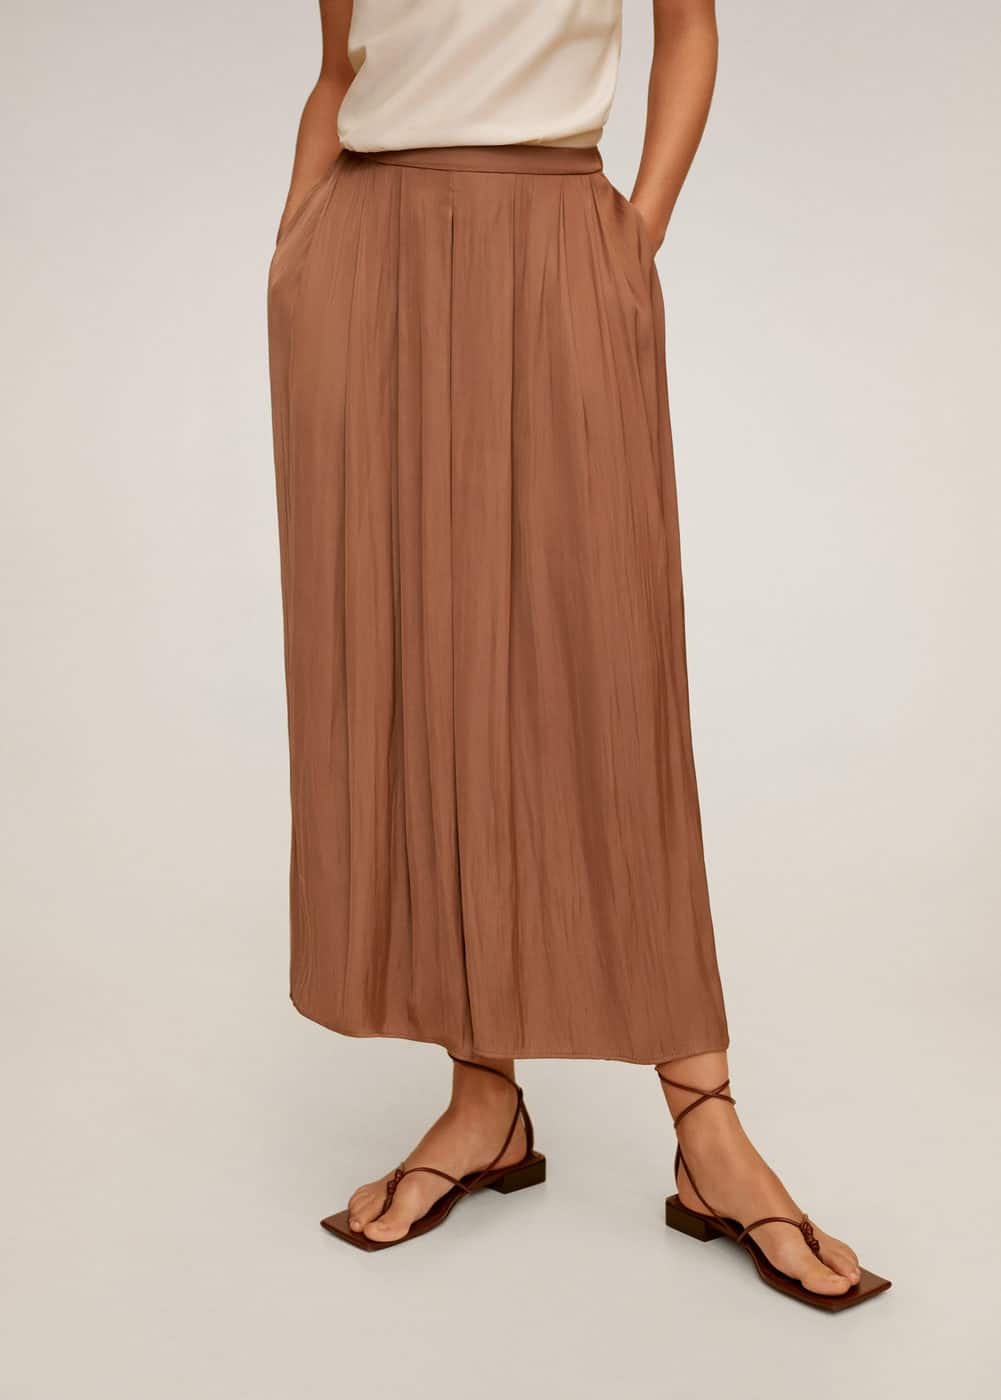 m-memory:pantalon cintura elastica